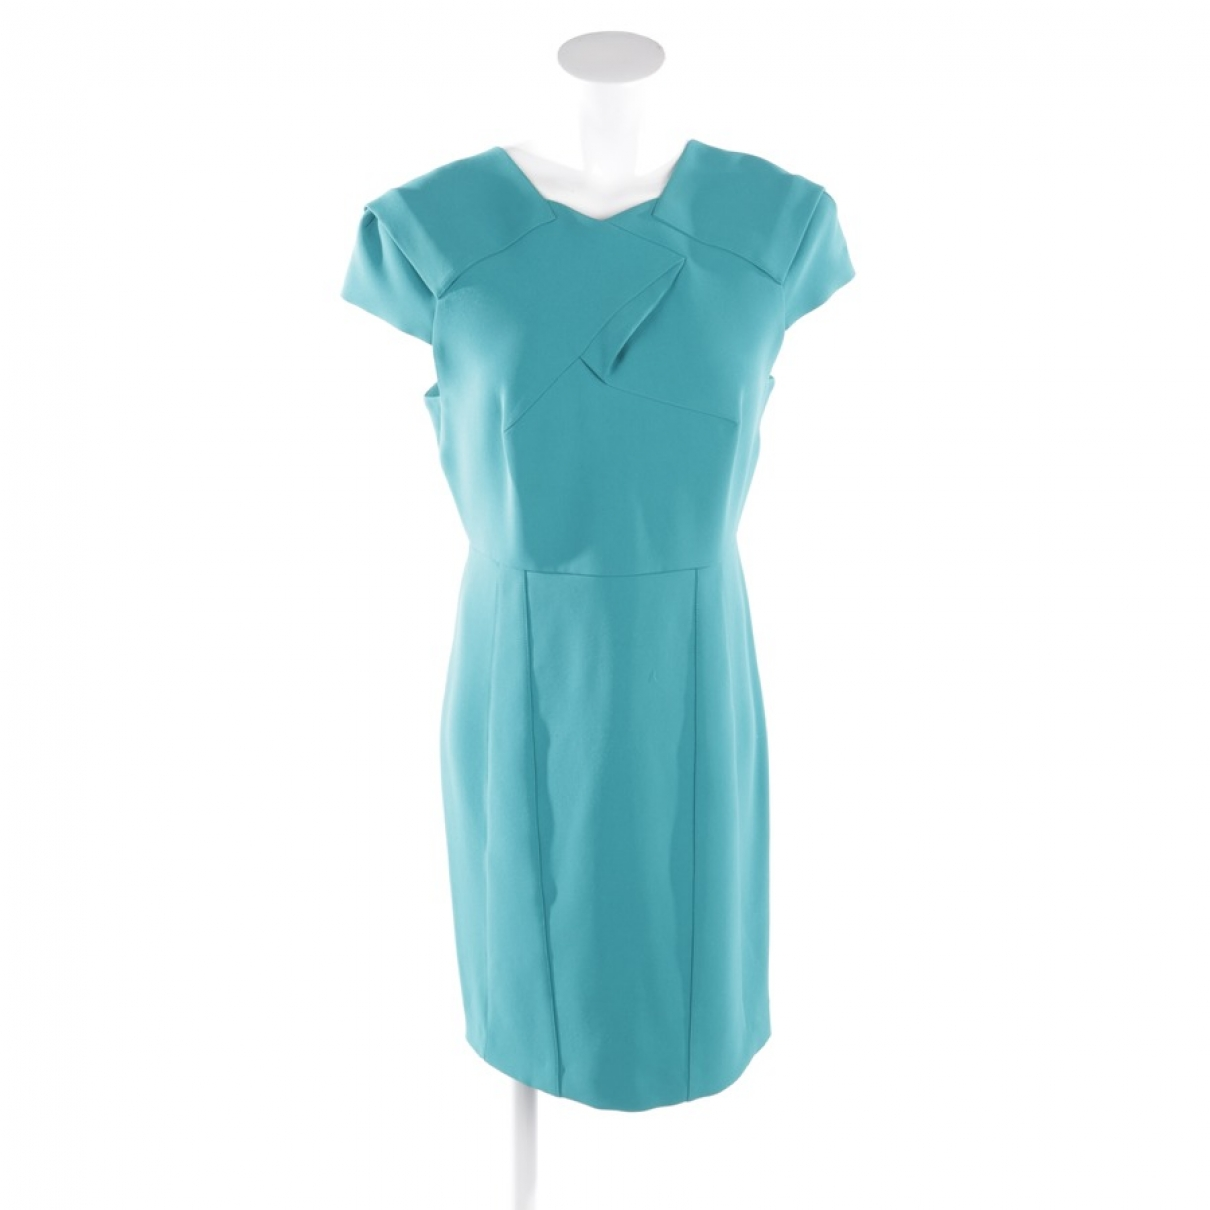 Roland Mouret \N Kleid in  Blau Synthetik